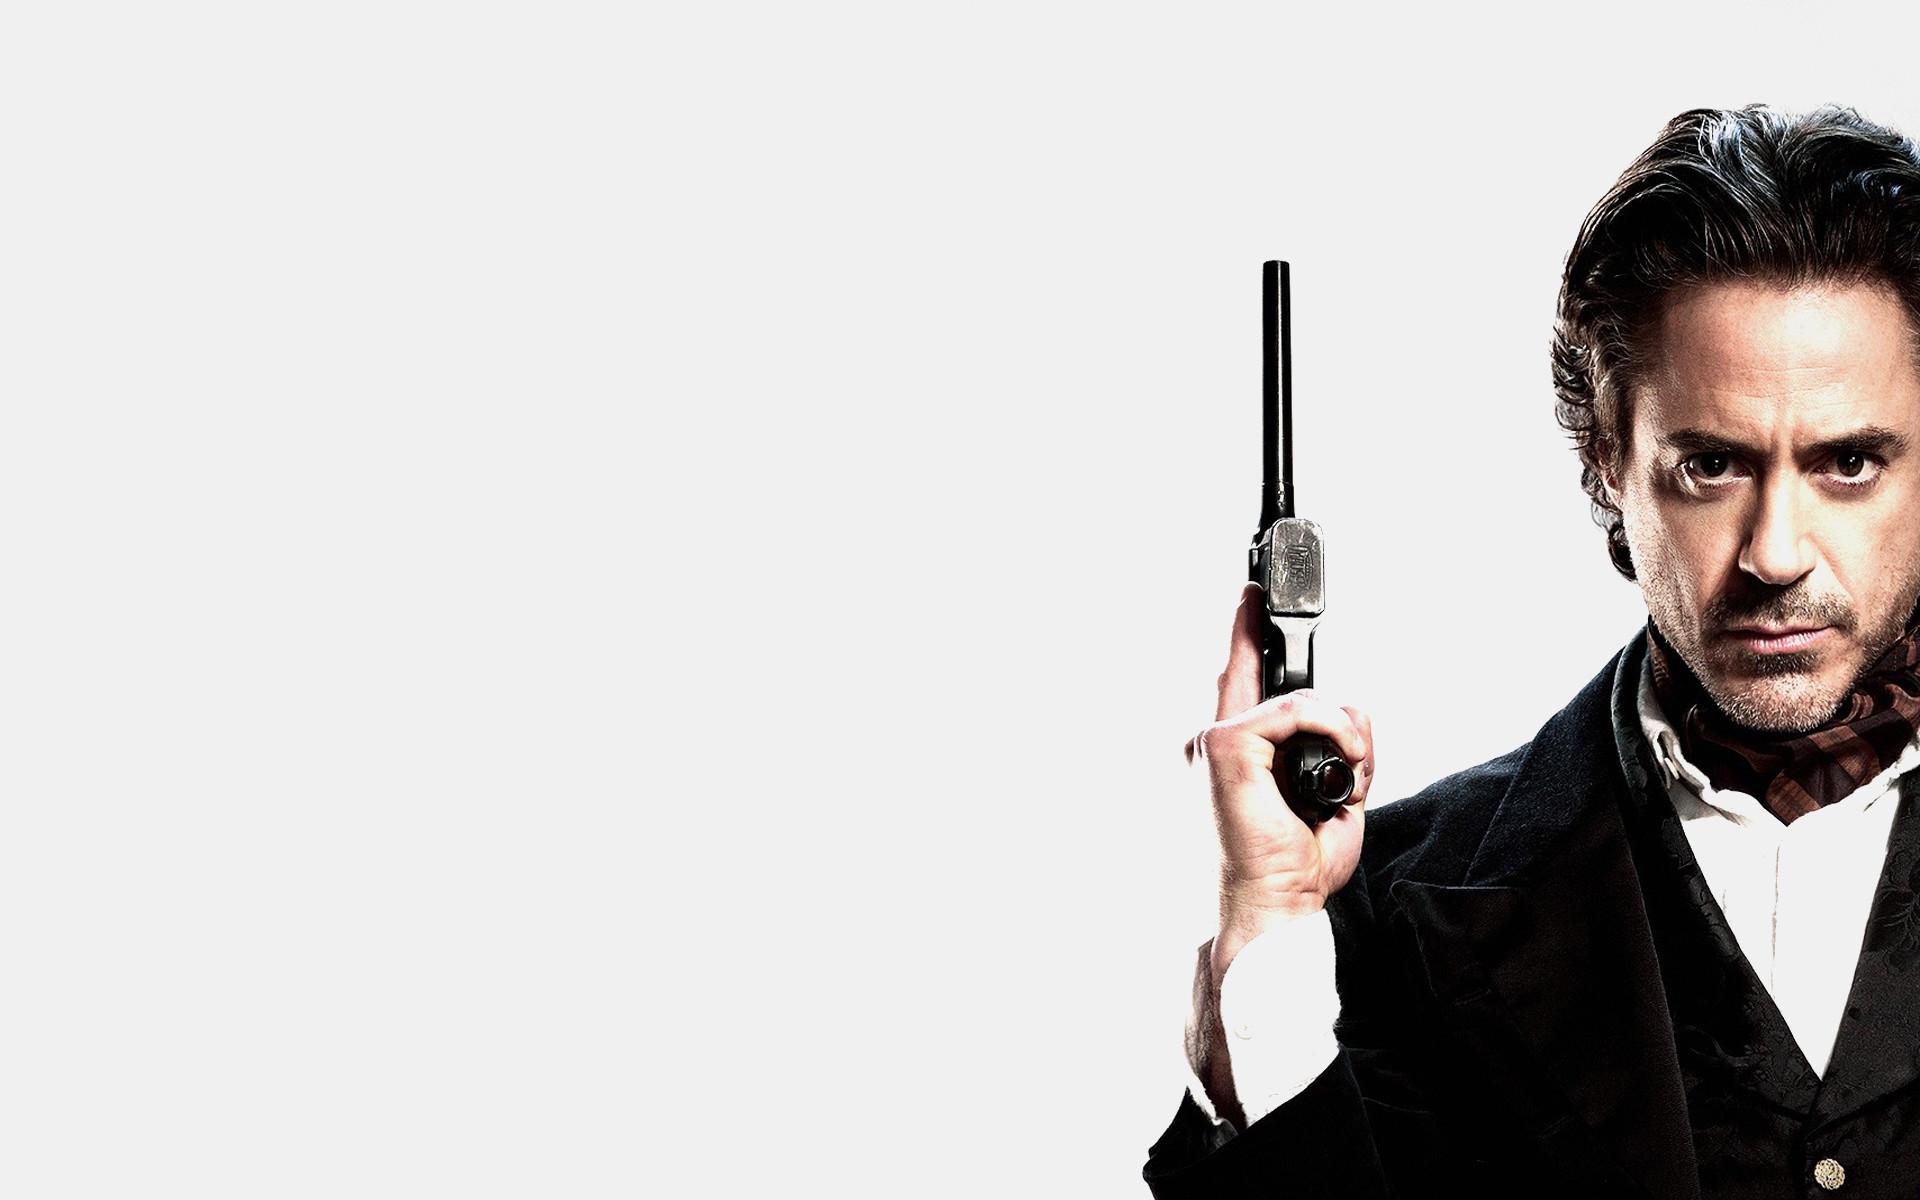 Robert Downey Jr Sherlock Holmes Wallpaper